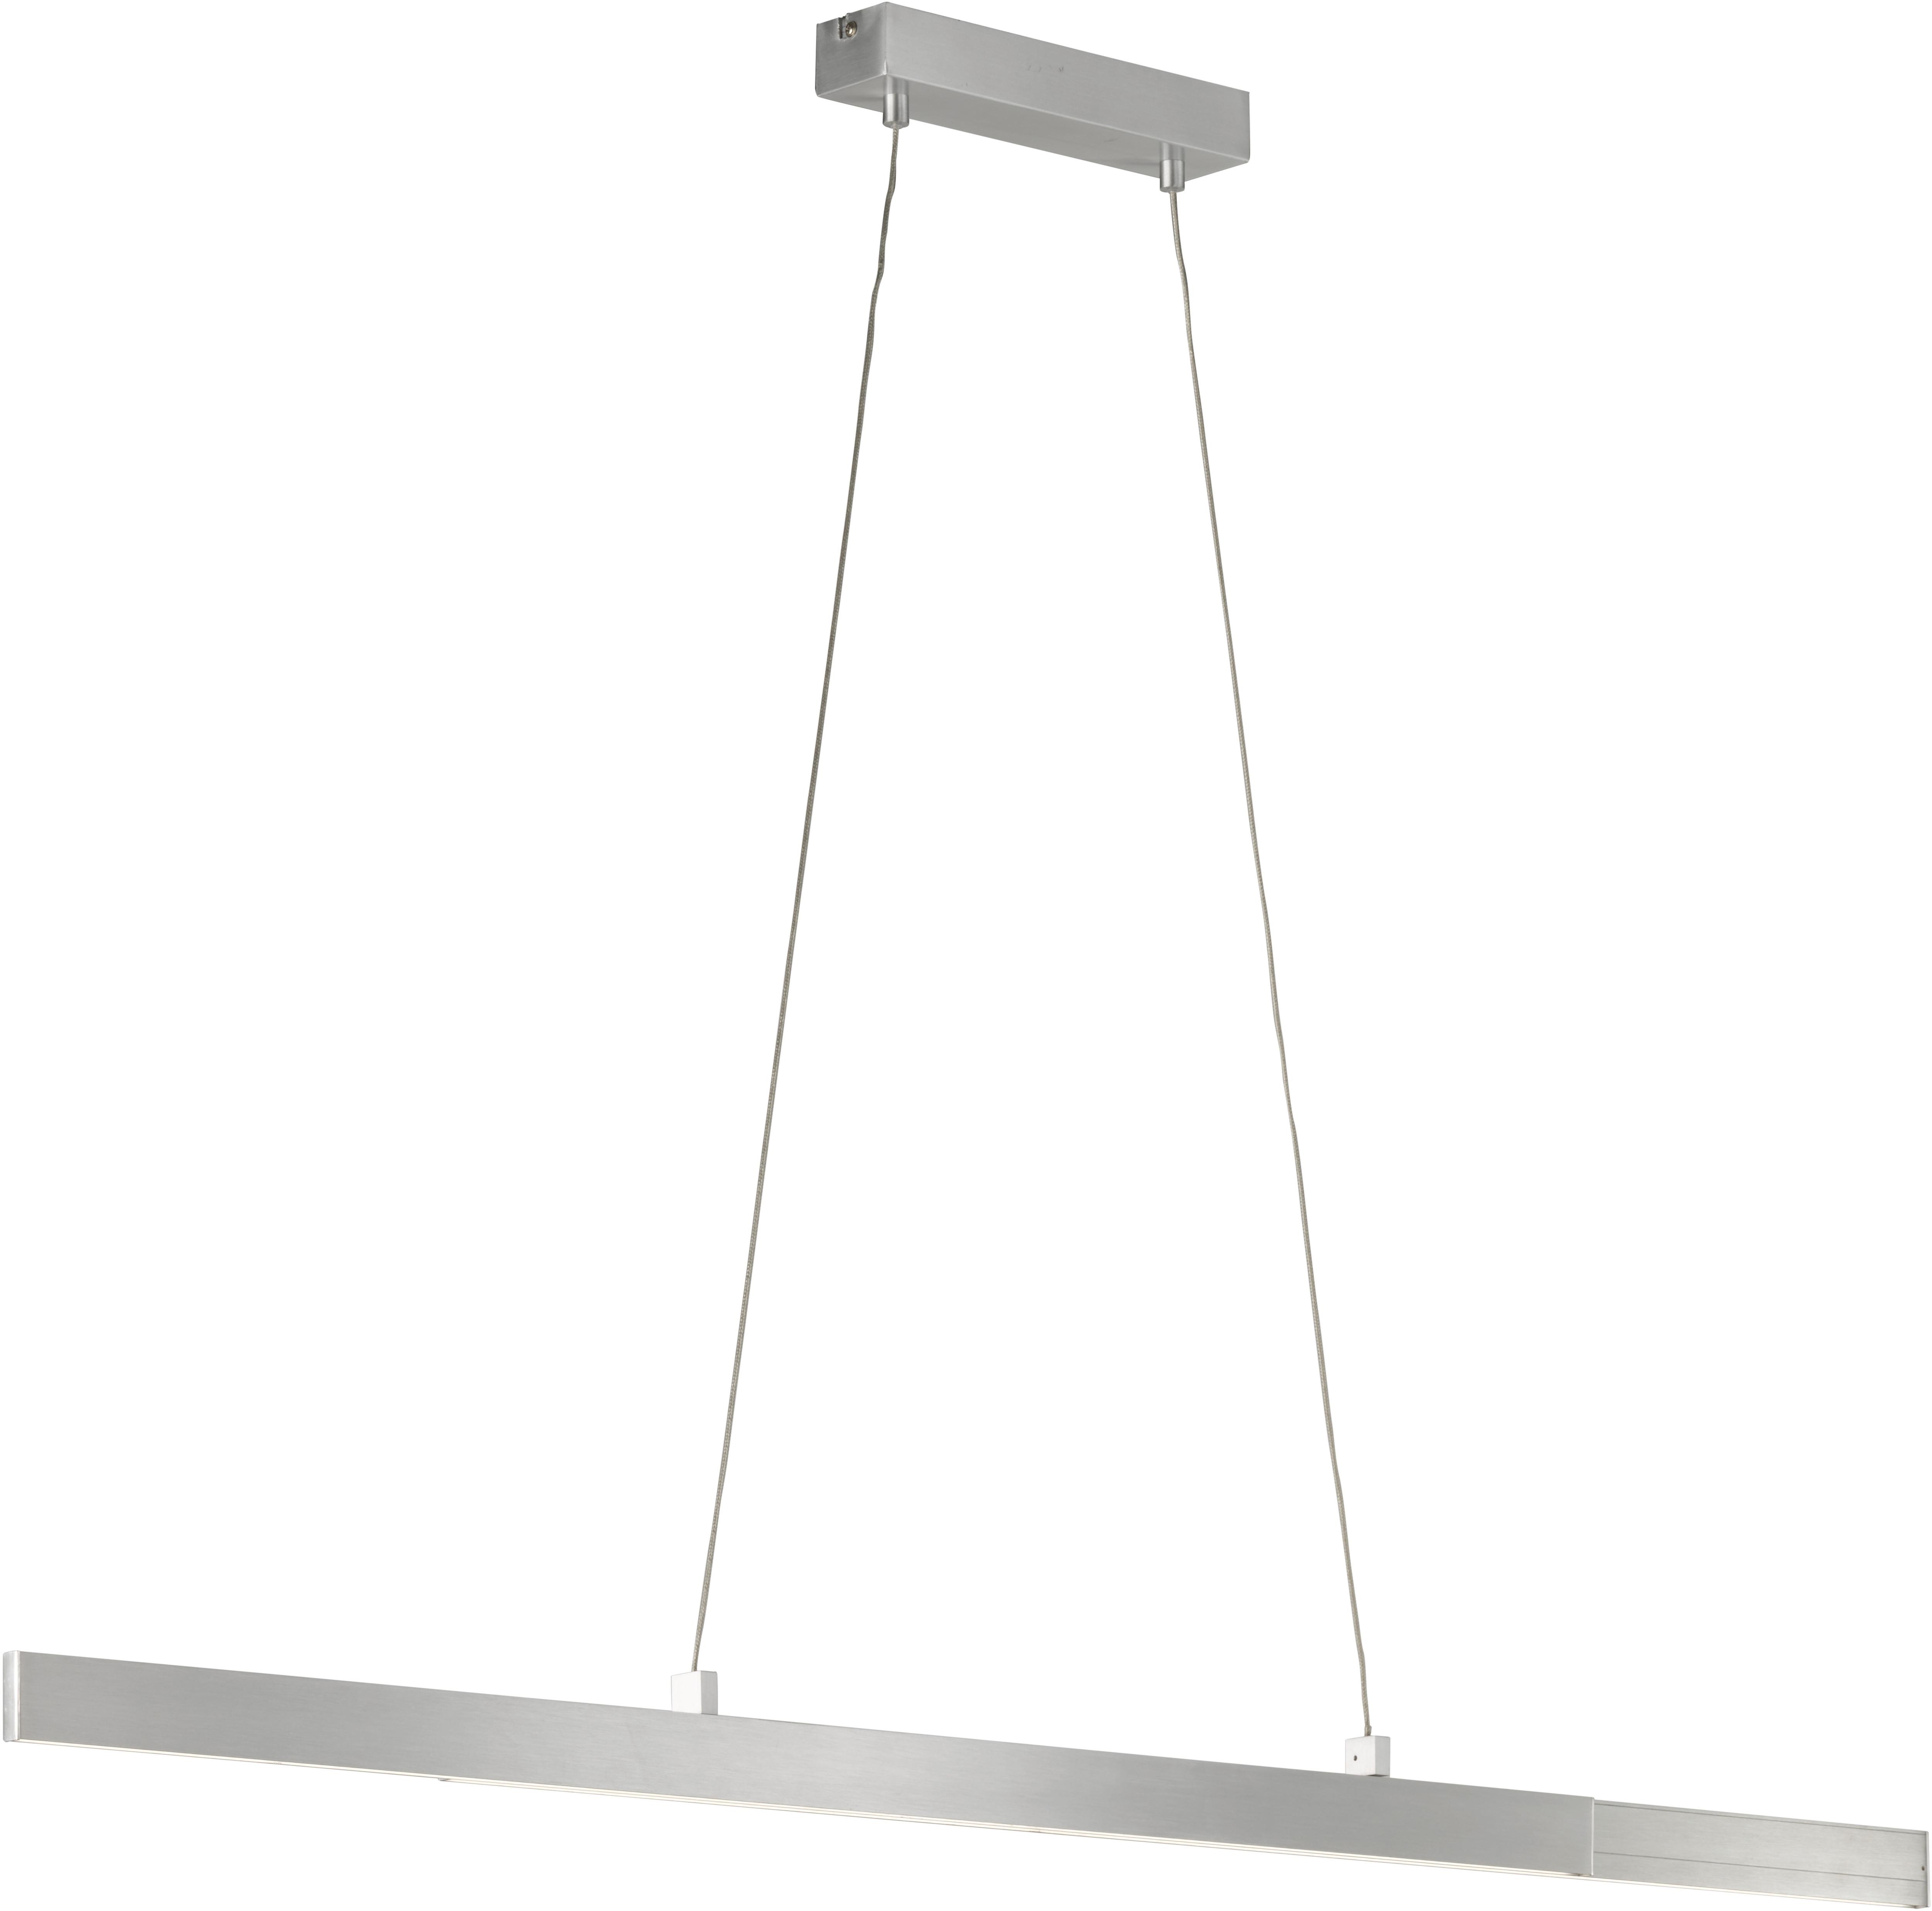 FISCHER & HONSEL LED Pendelleuchte Orell, LED-Modul, Warmweiß